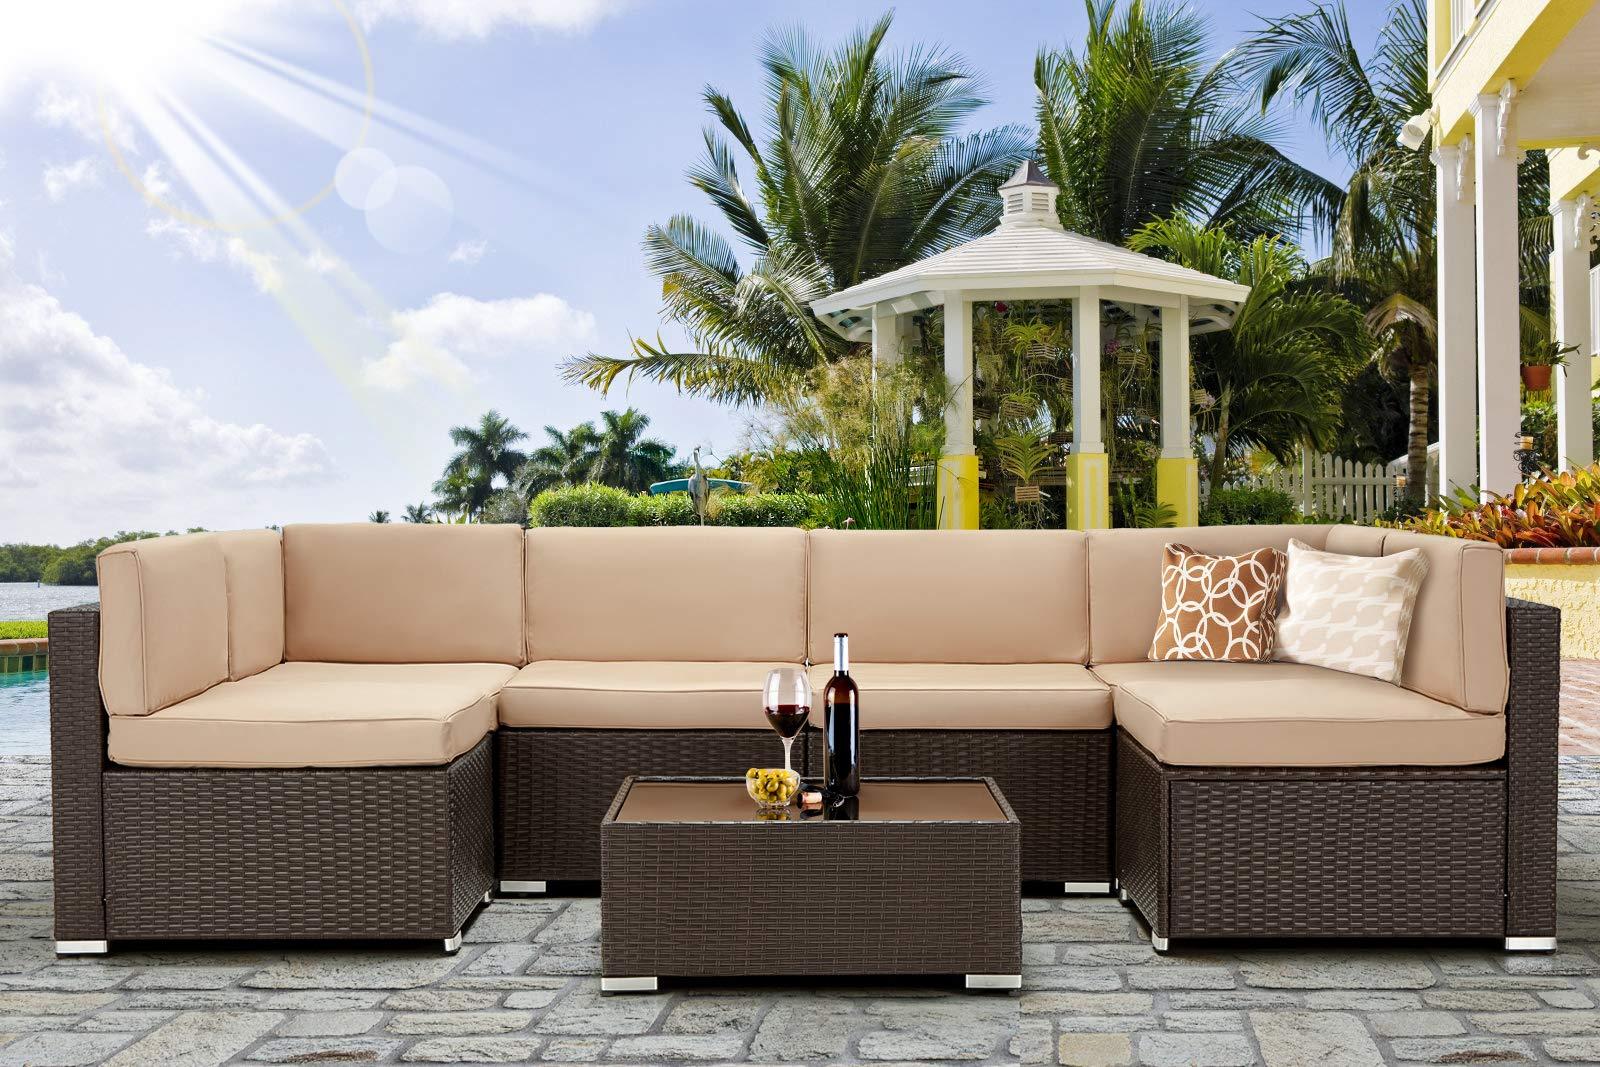 U-MAX 7 Piece Outdoor Patio Furniture Set, PE Rattan Wicker Sofa Set, Outdoor Sectional Furniture Chair Set with Khaki Cus...